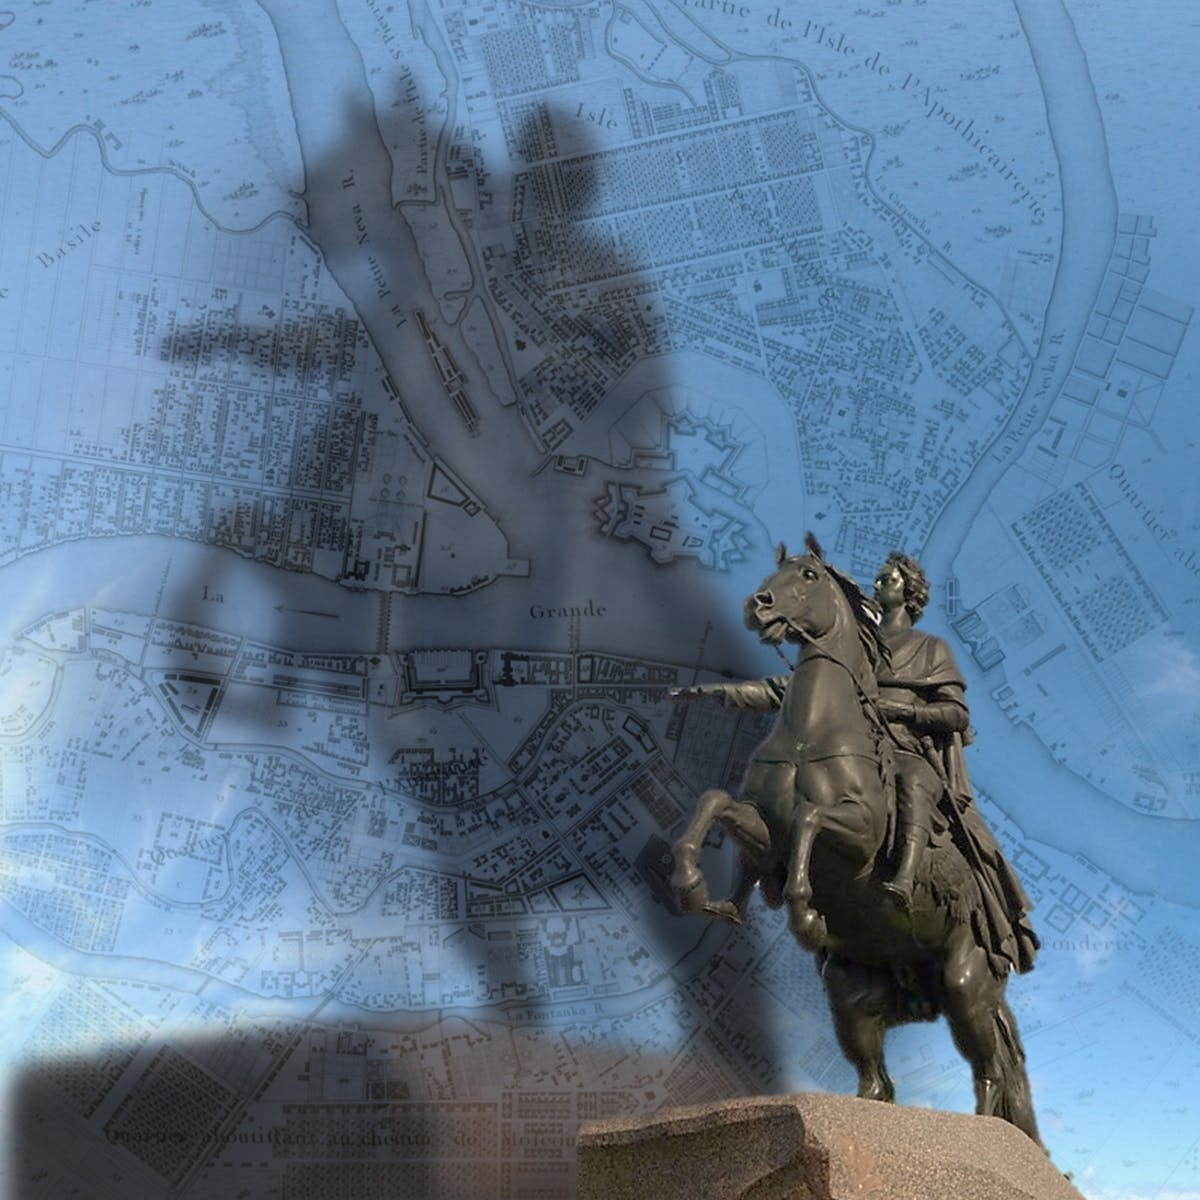 Санкт-Петербург – столица империи Петра I